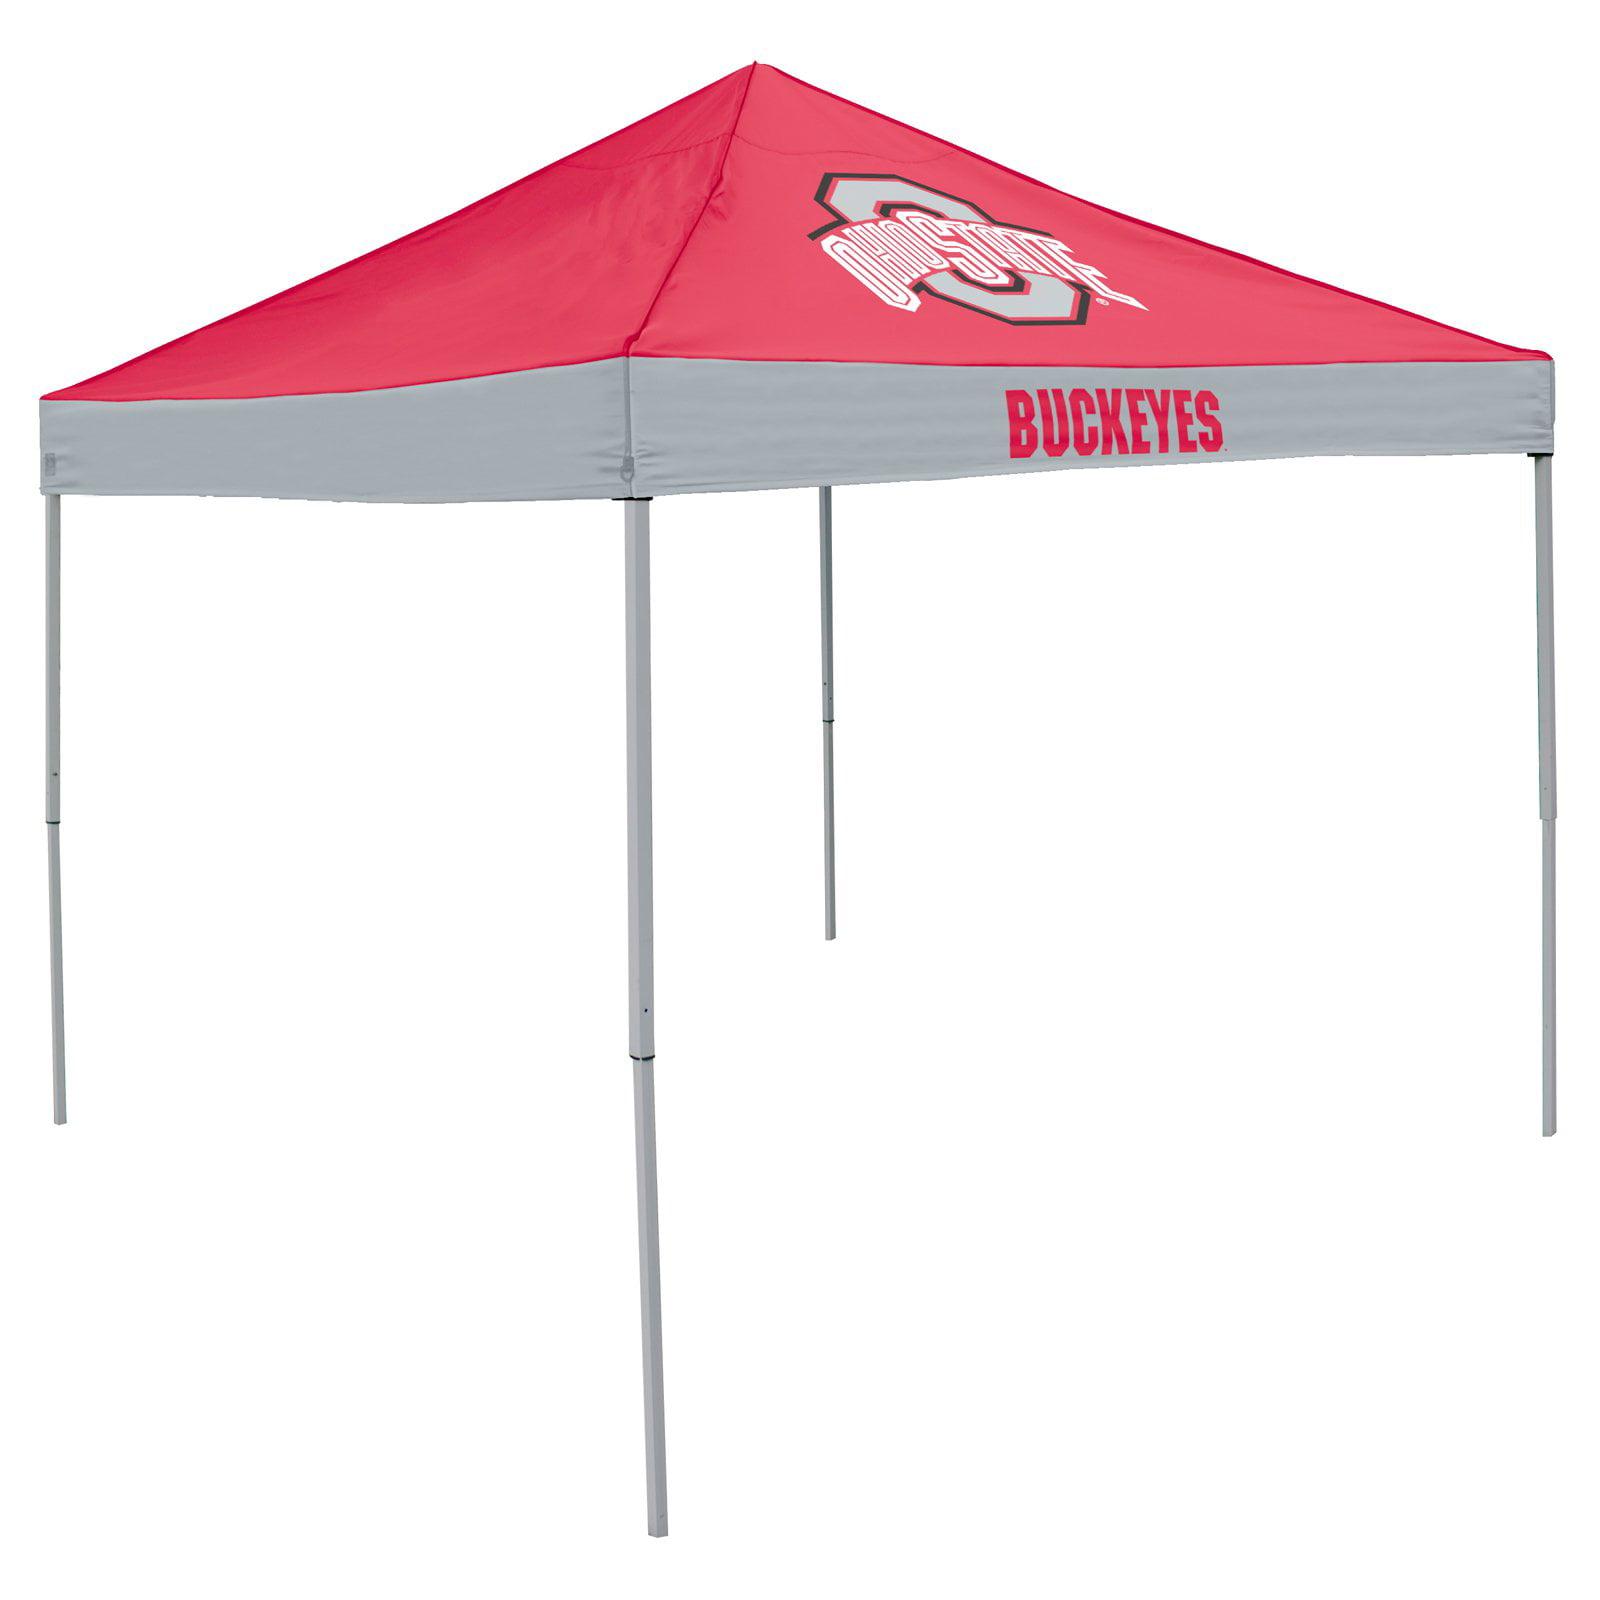 Logo Chairs NCAA Ohio State 9' x 9' Economy Tent, Sleeps 4